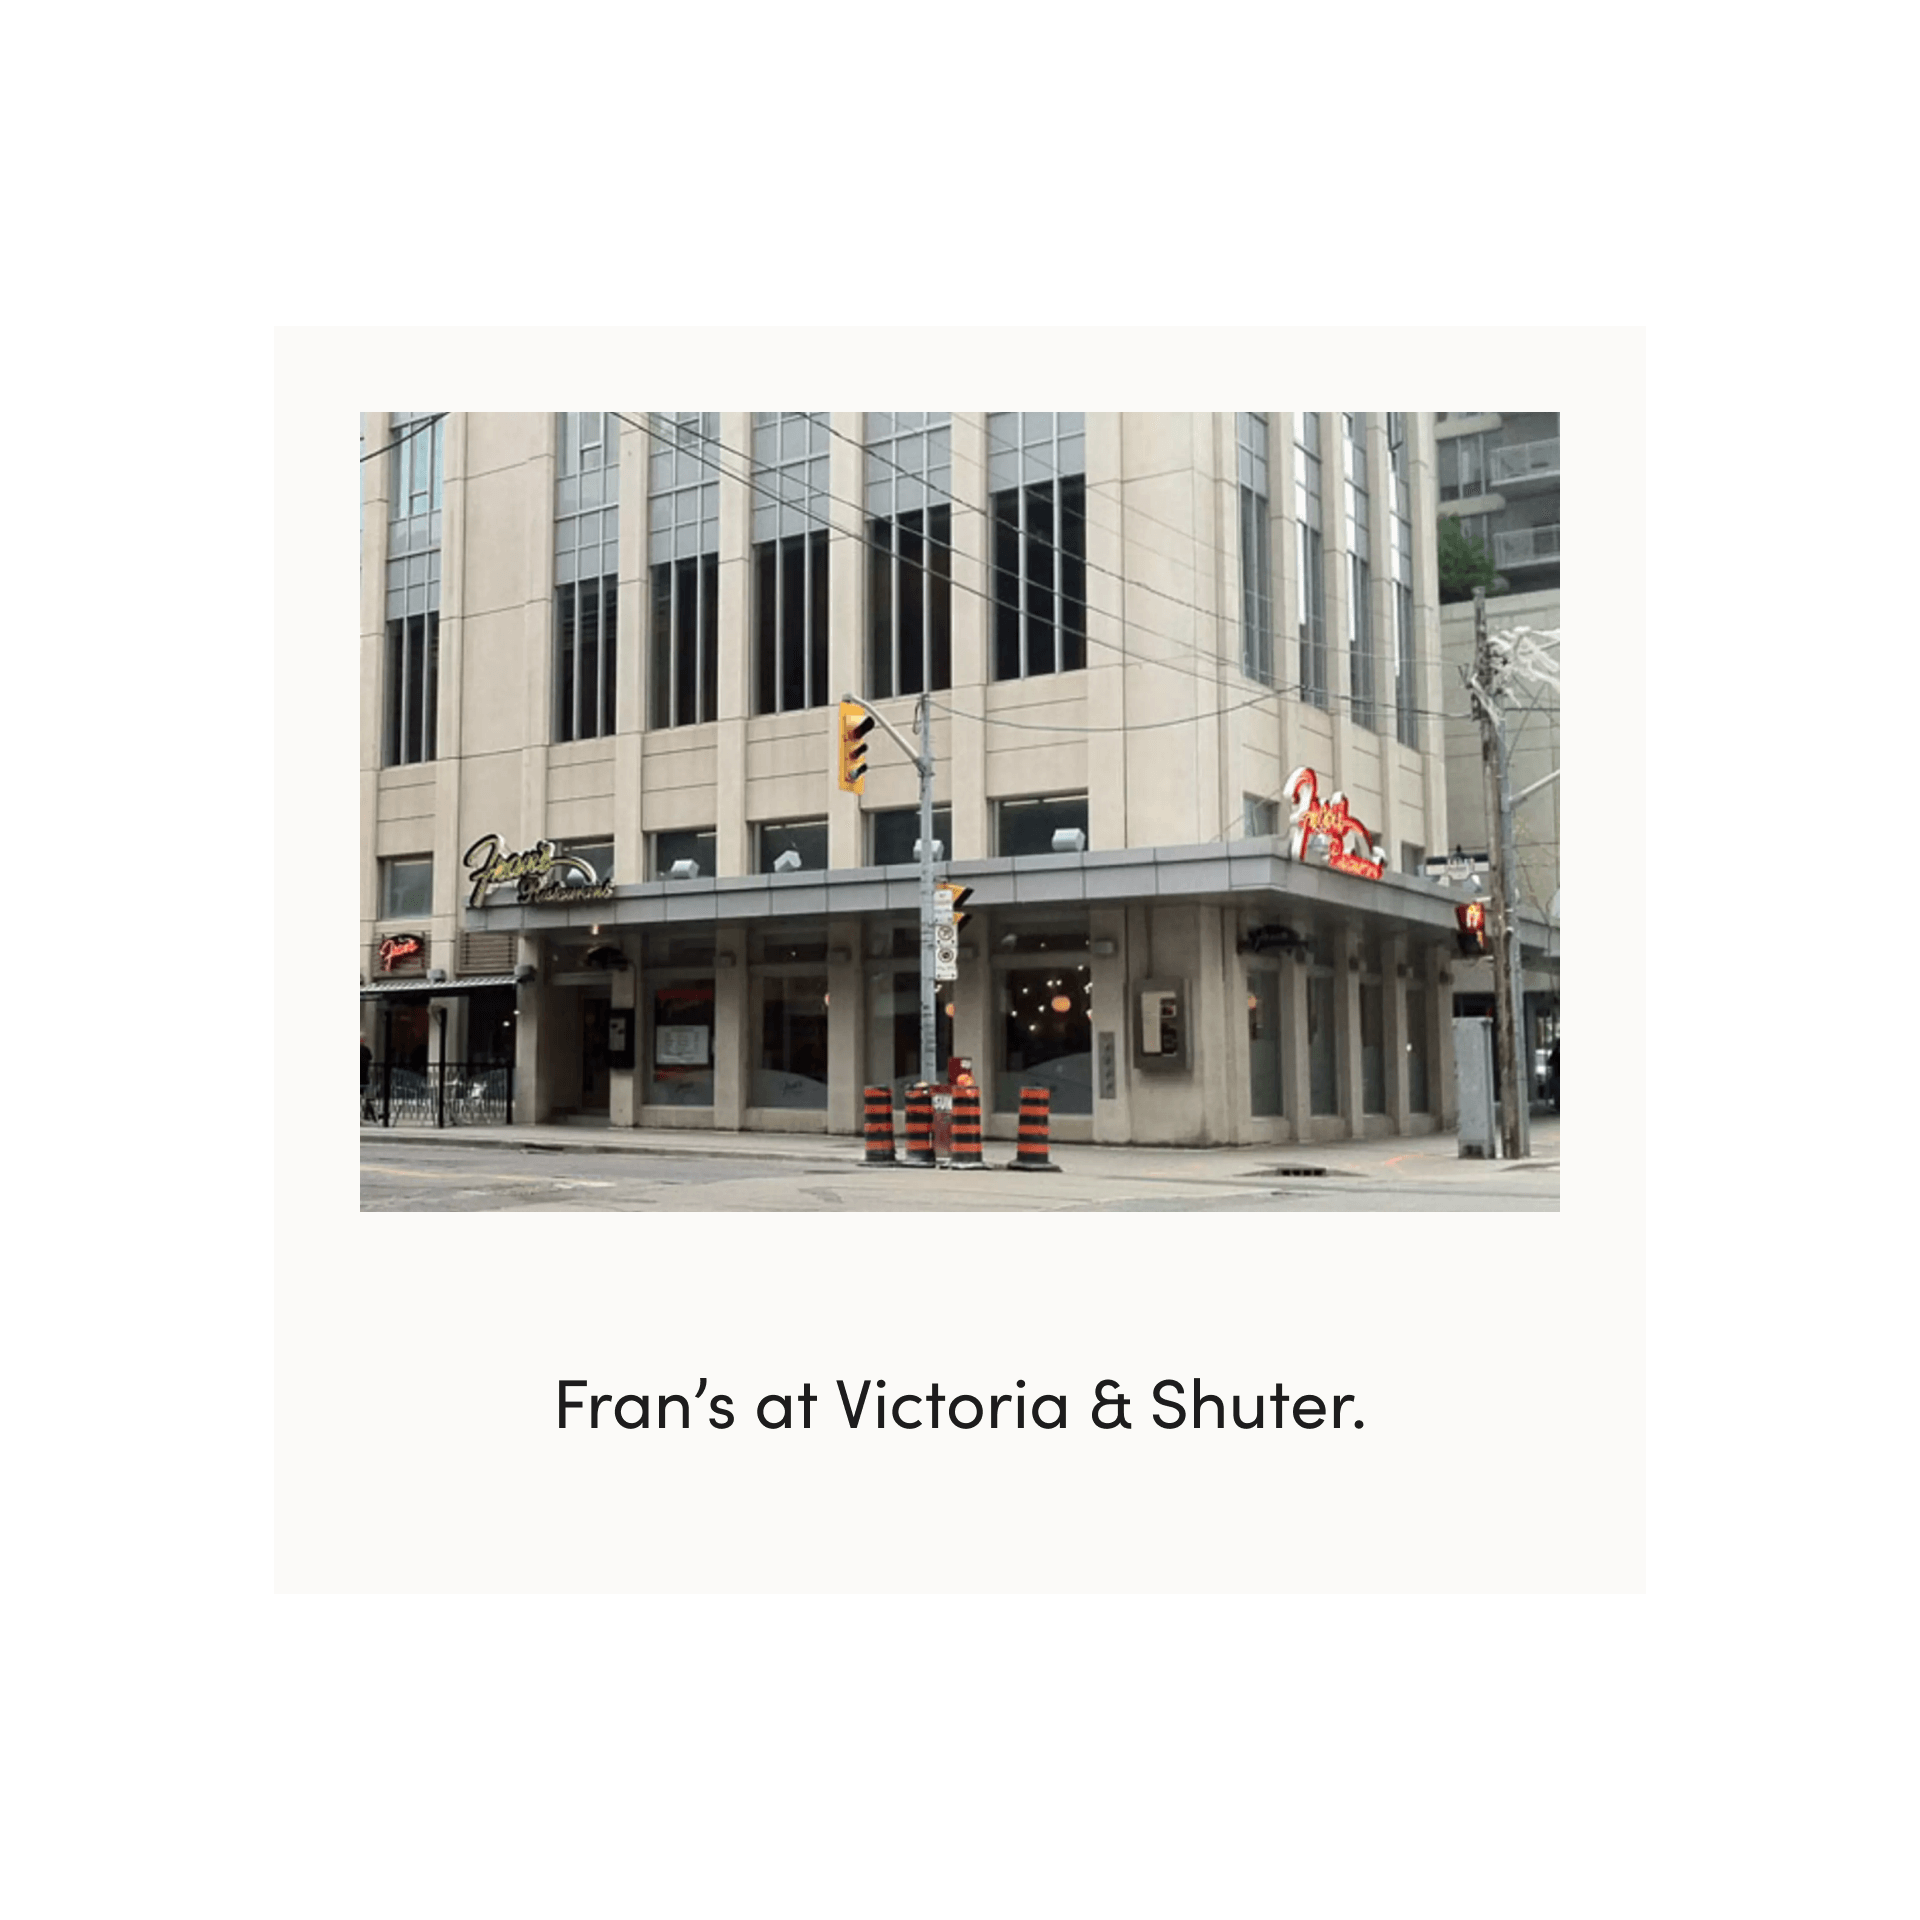 fran's restaurant on victoria street